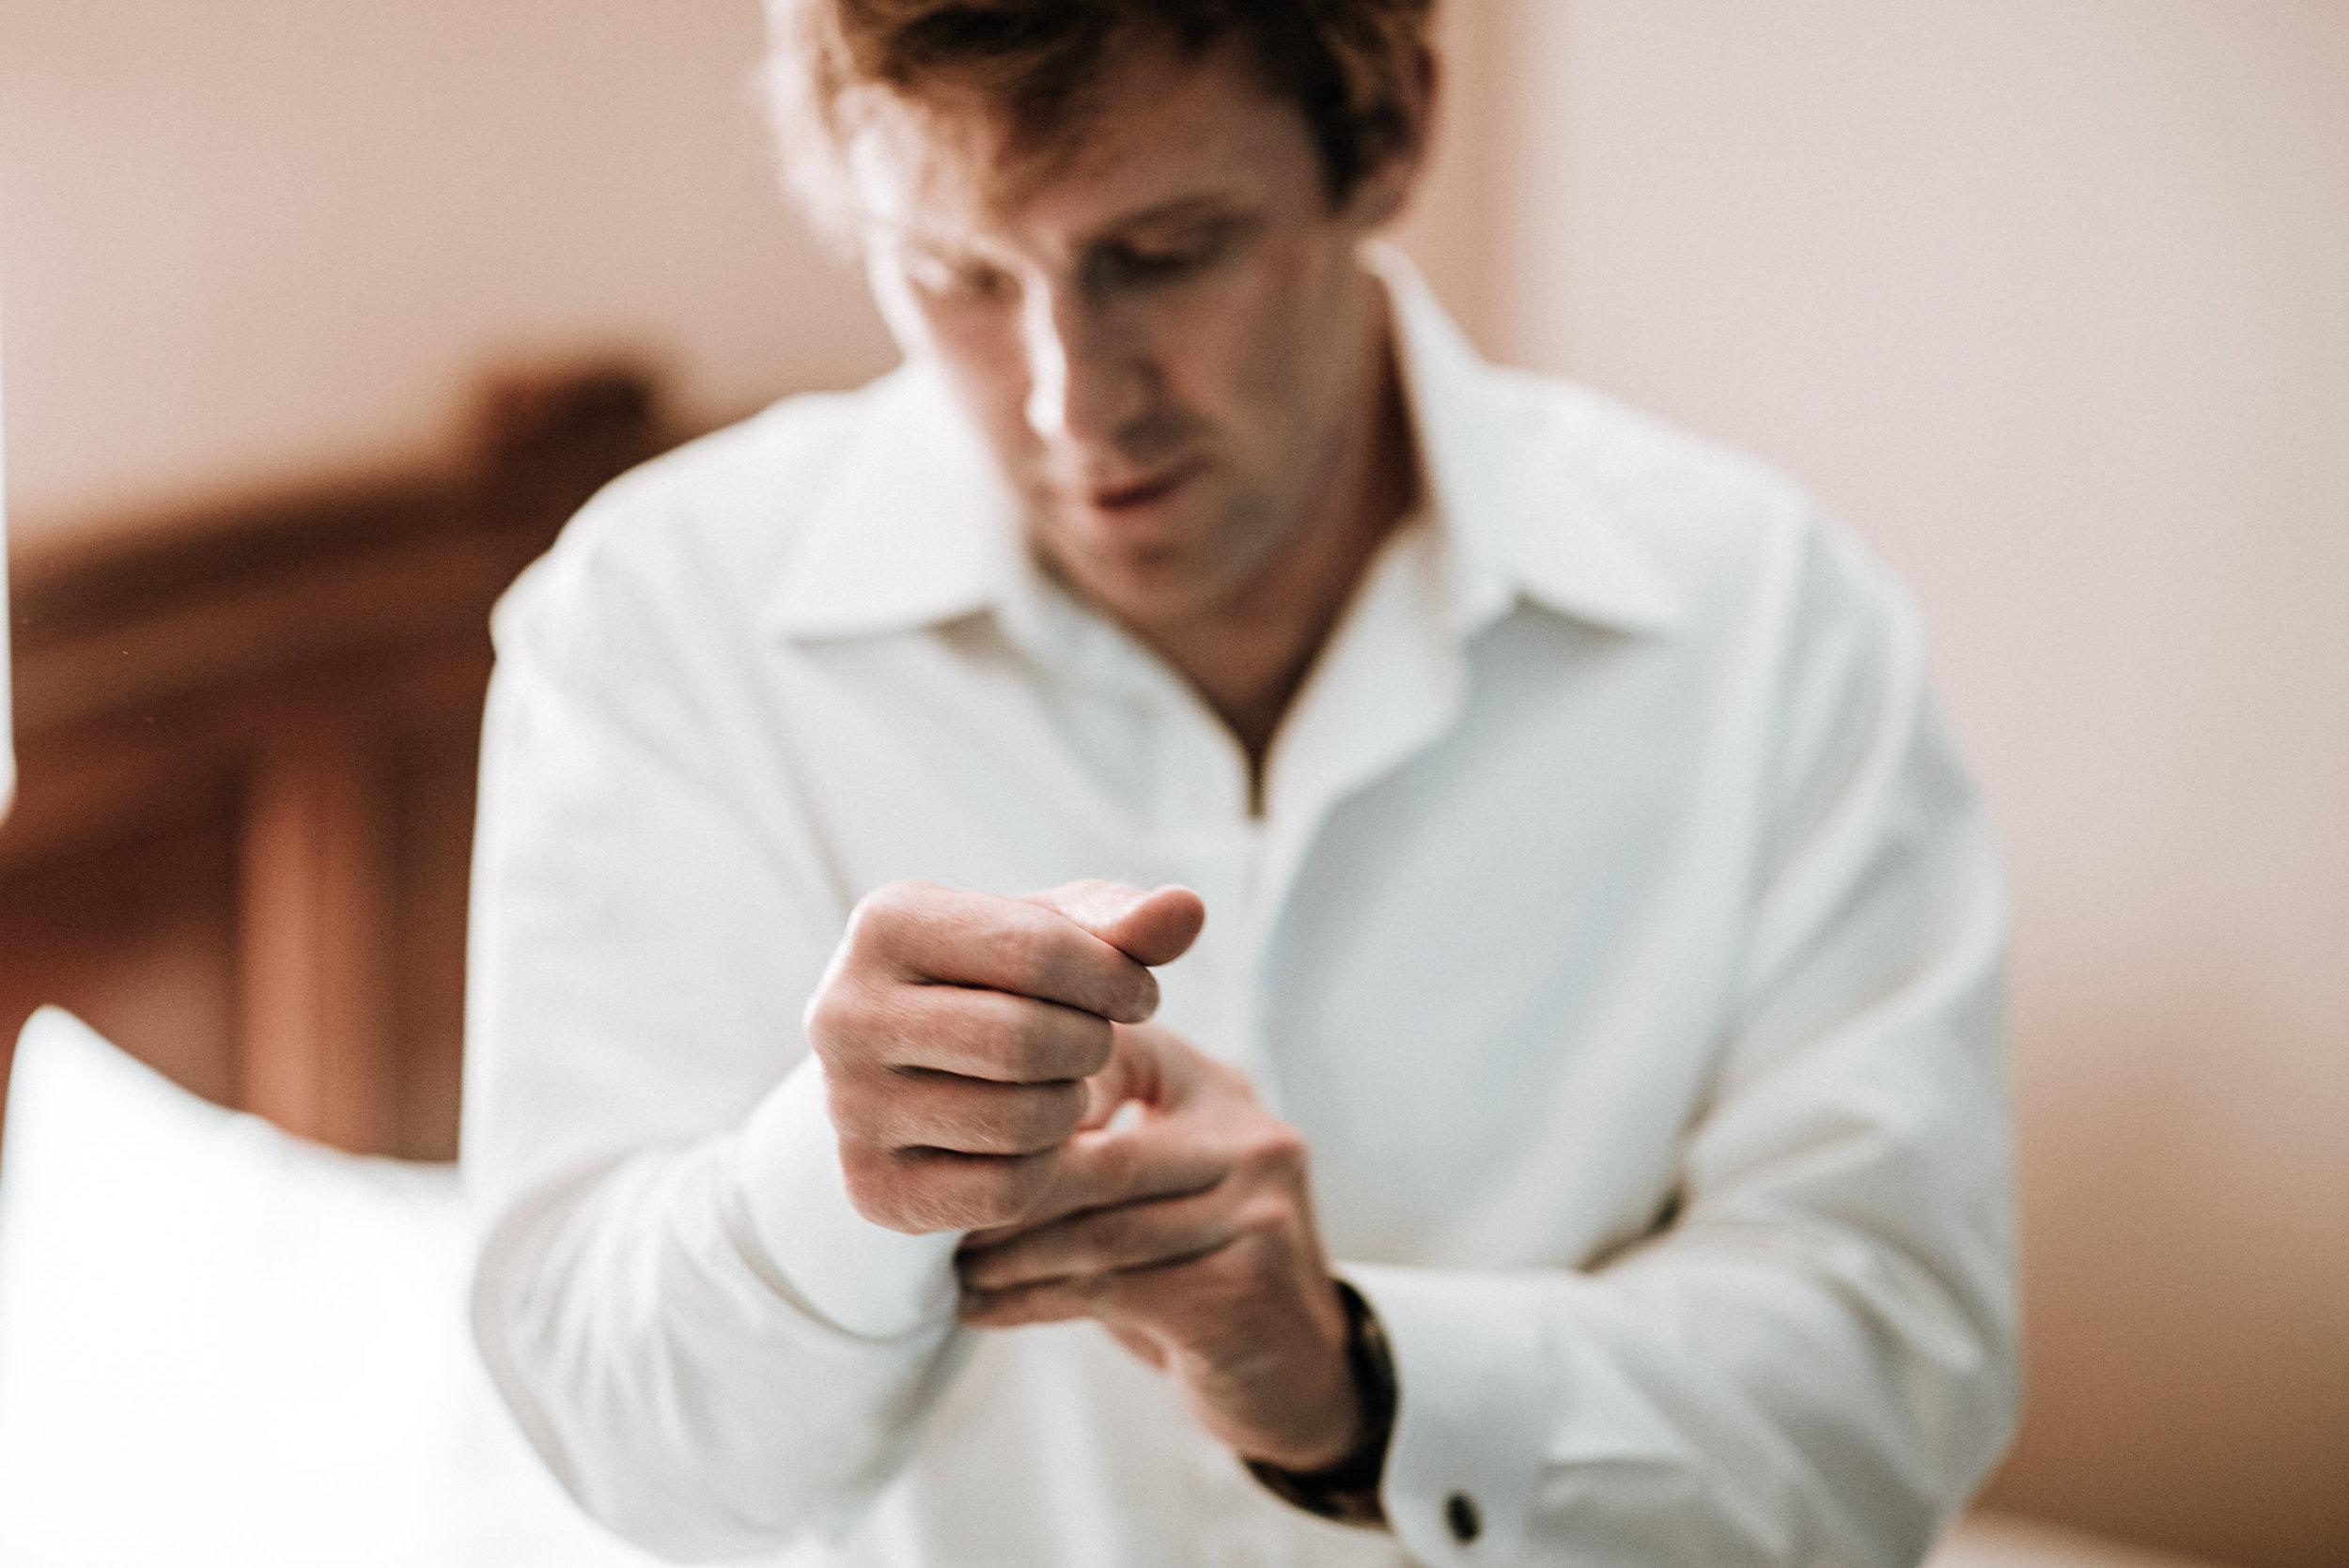 Man buttoning cuffs